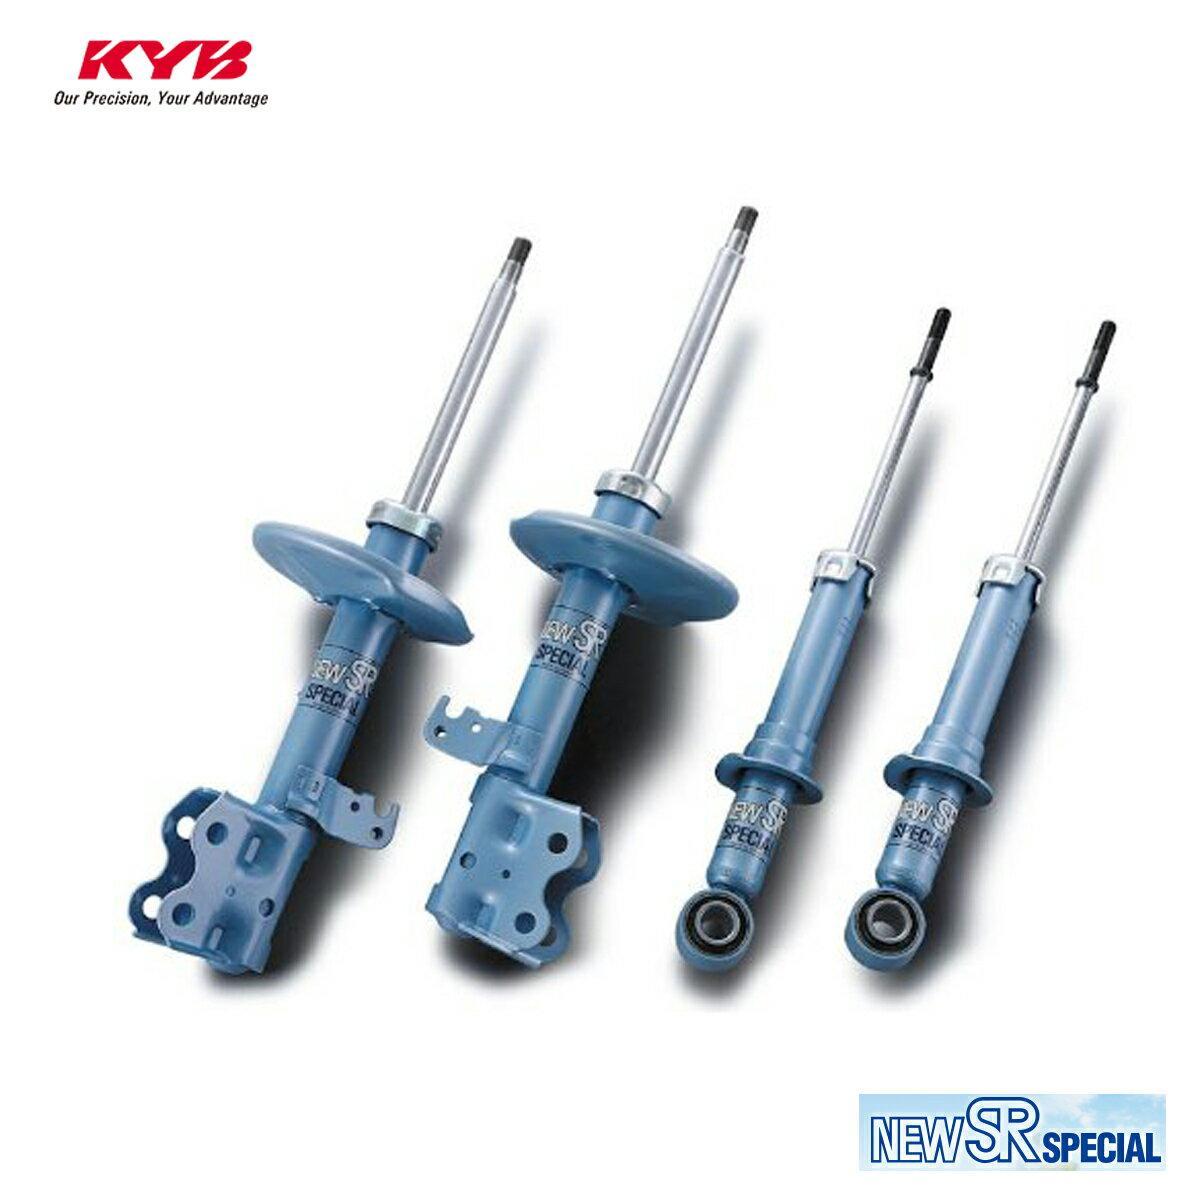 KYB カヤバ セレナ KAJC23 ショックアブソーバー フロント 右用 1本 NEW SR SPECIAL NST5117R 配送先条件有り